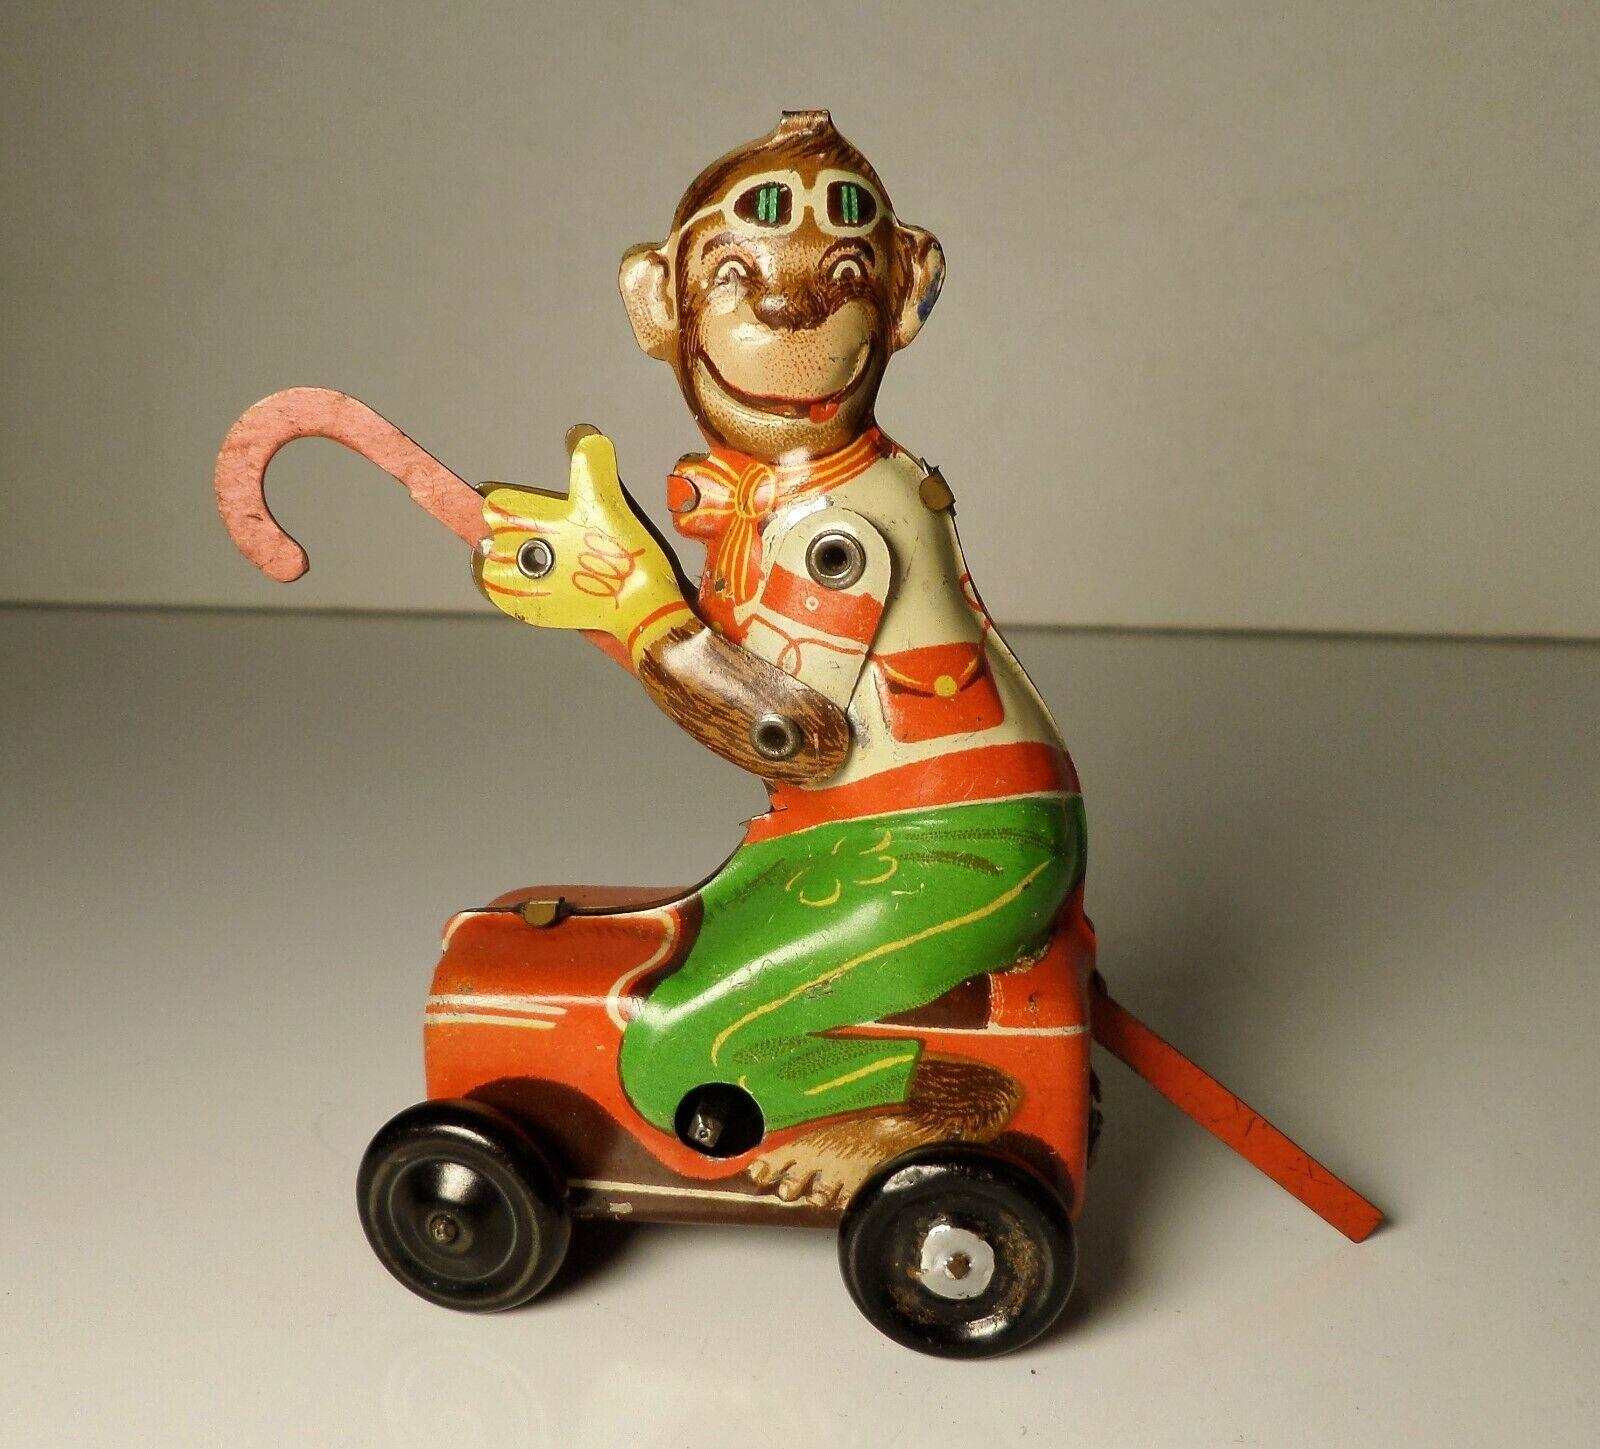 Vintage Tin Toy Windup Litho Monkey on bil w  Cane Penny Toy